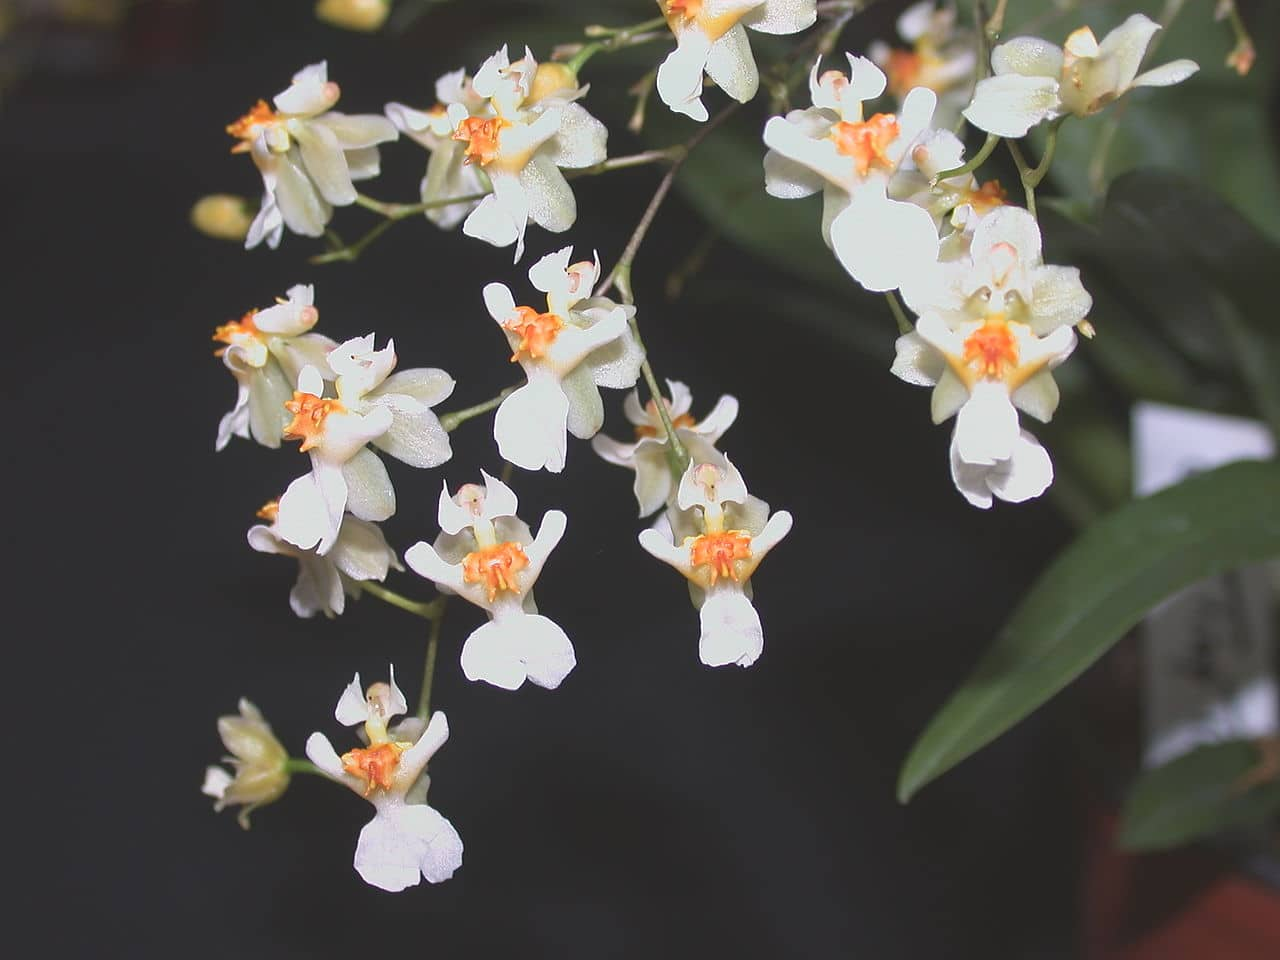 El Oncidium es una planta muy bonita